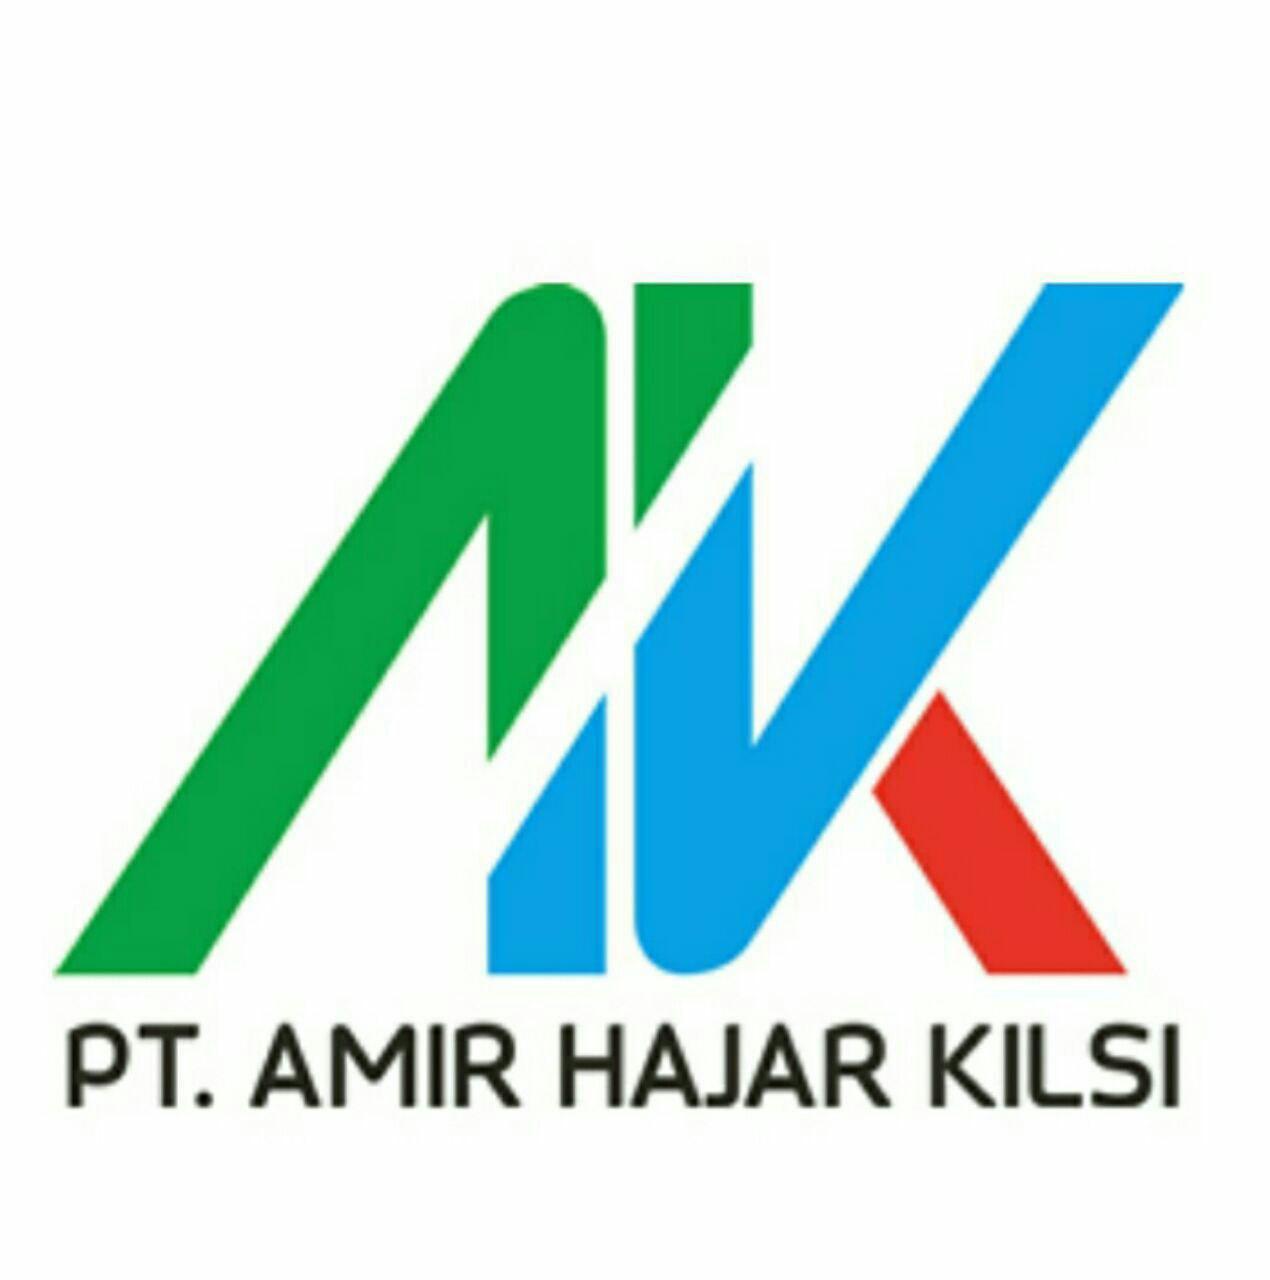 PT. Amir Hajar Kilsi - Perusahaan Tambang Terbaik Di Rembang